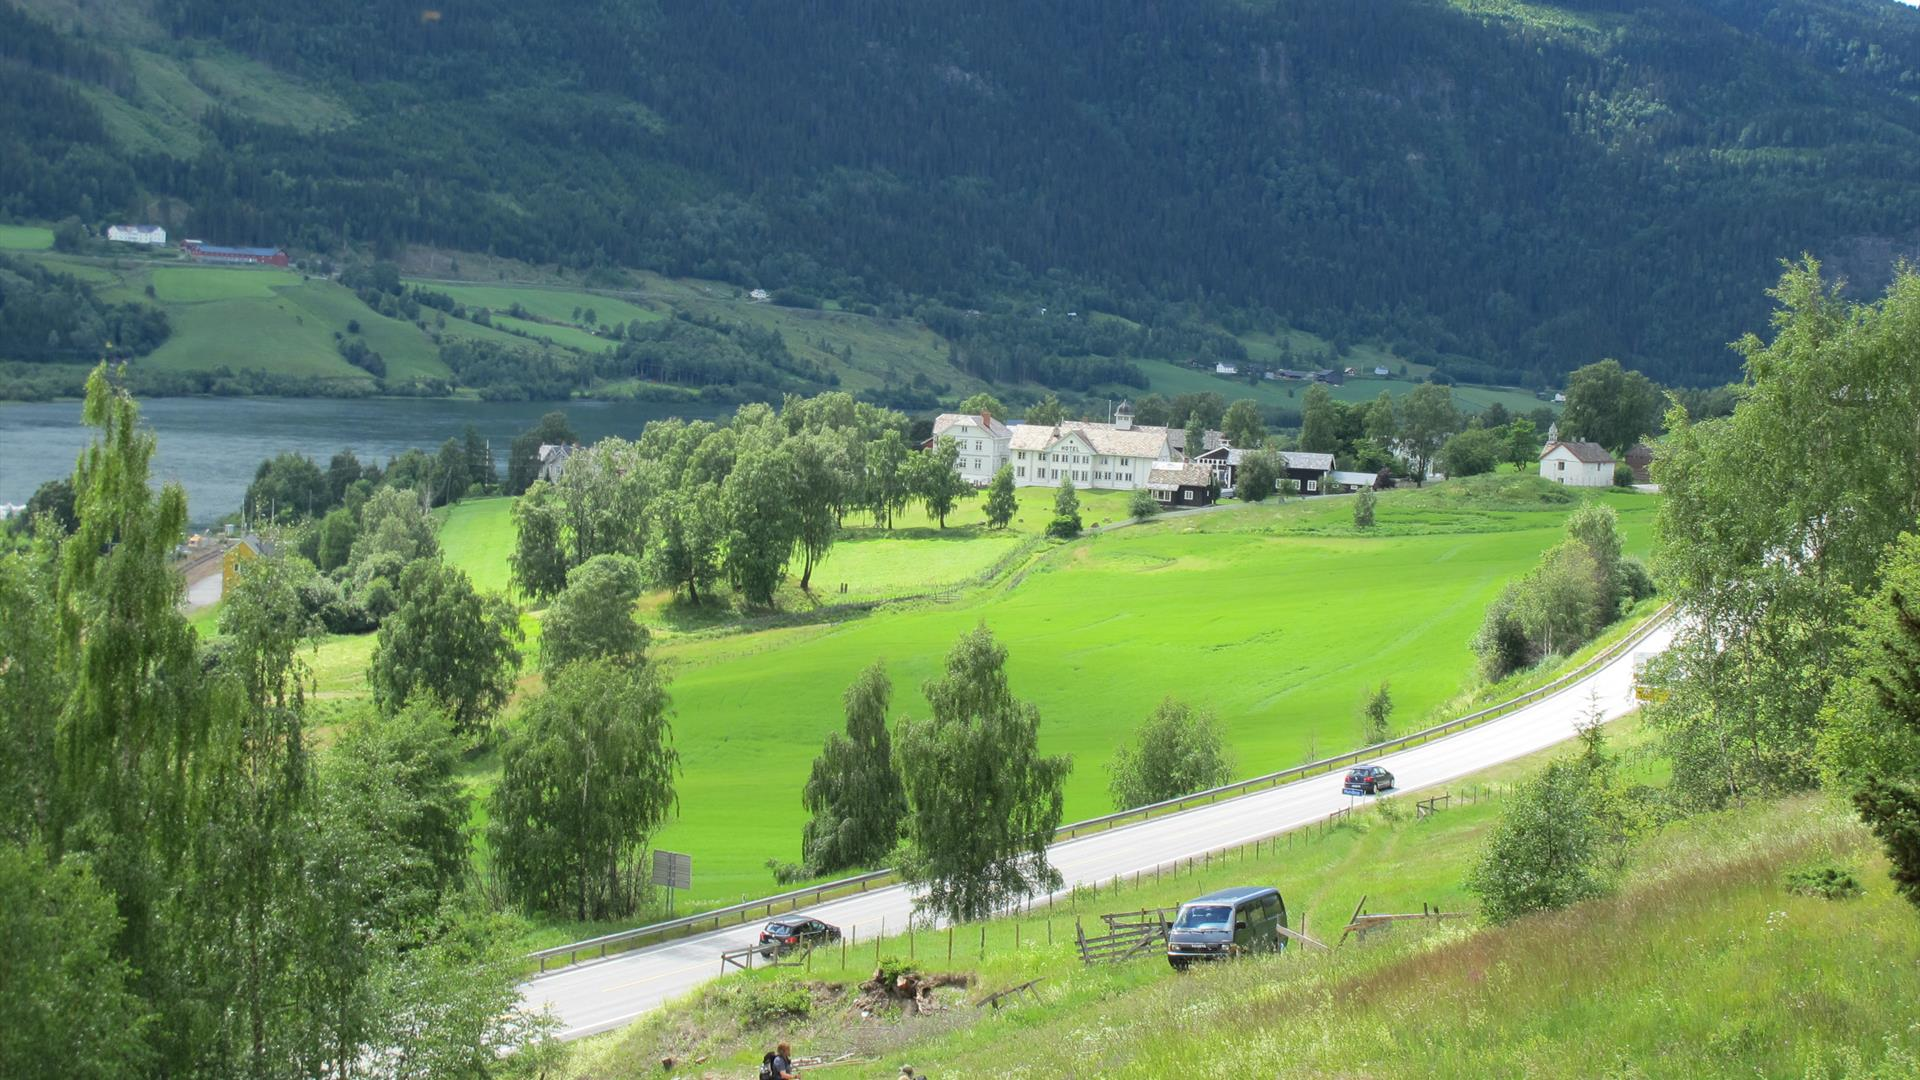 View towards Dale-Gudbrands Gard